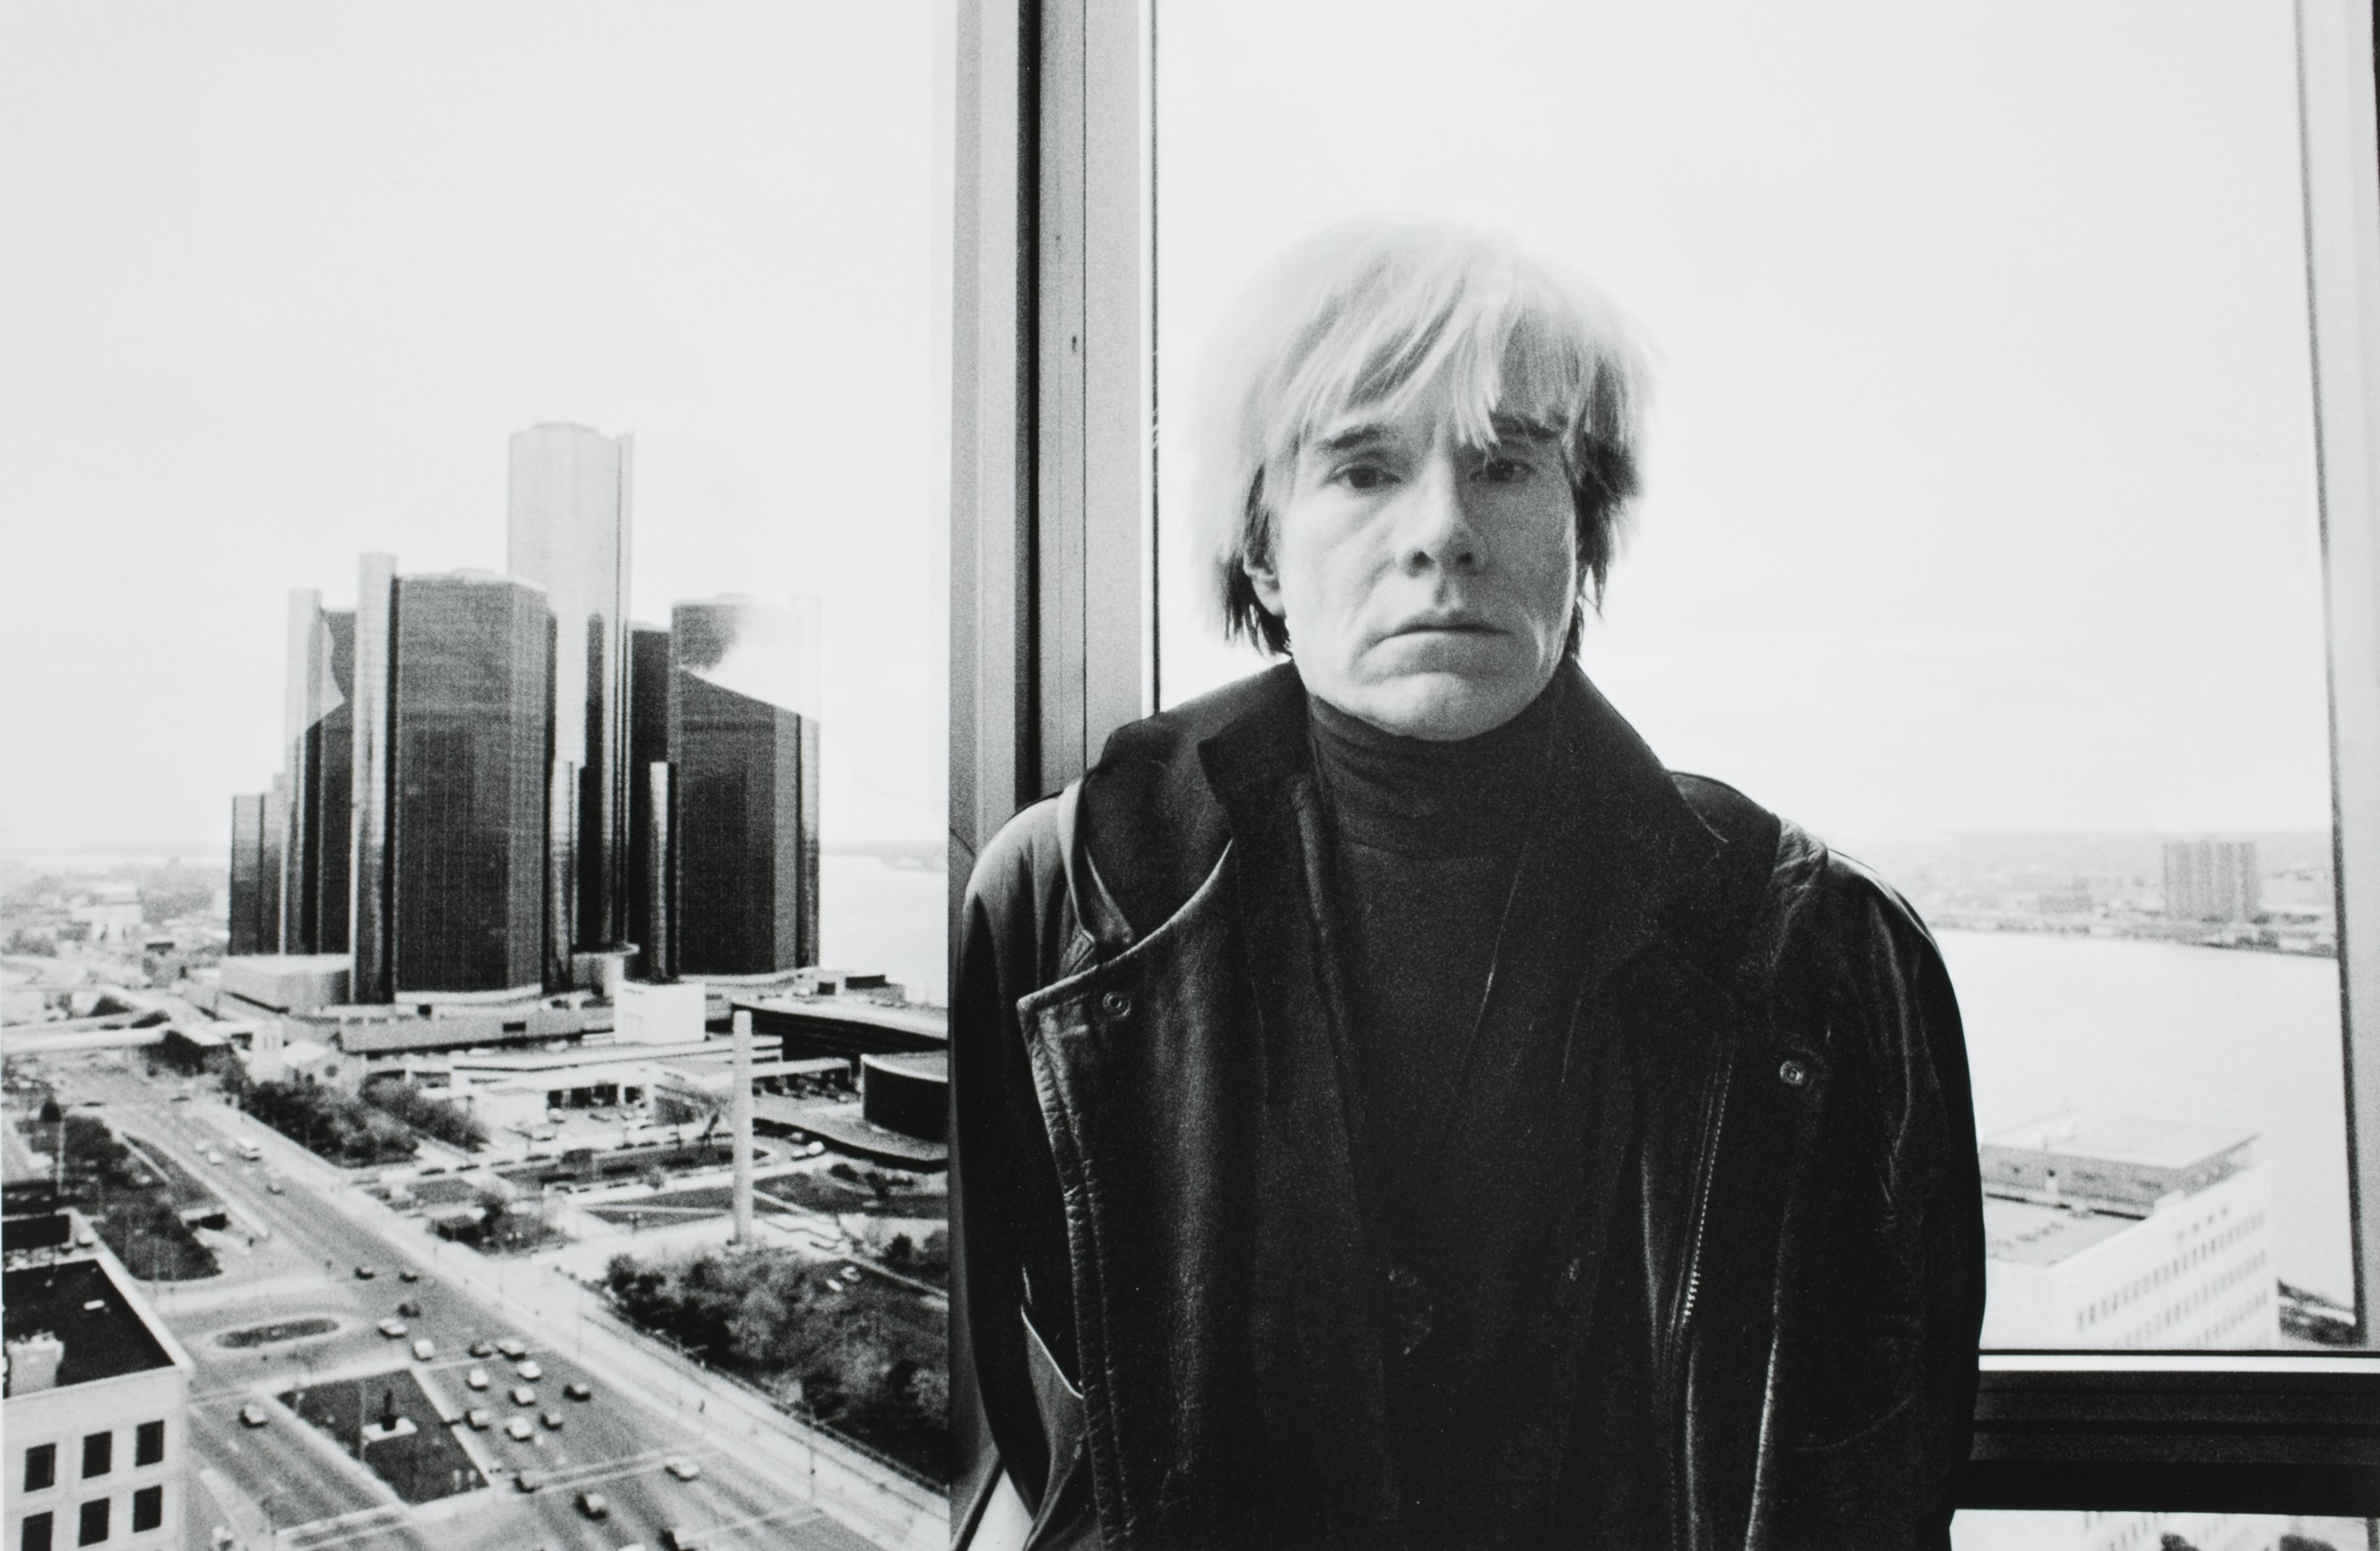 Mostra di Andy Warhol in Italia